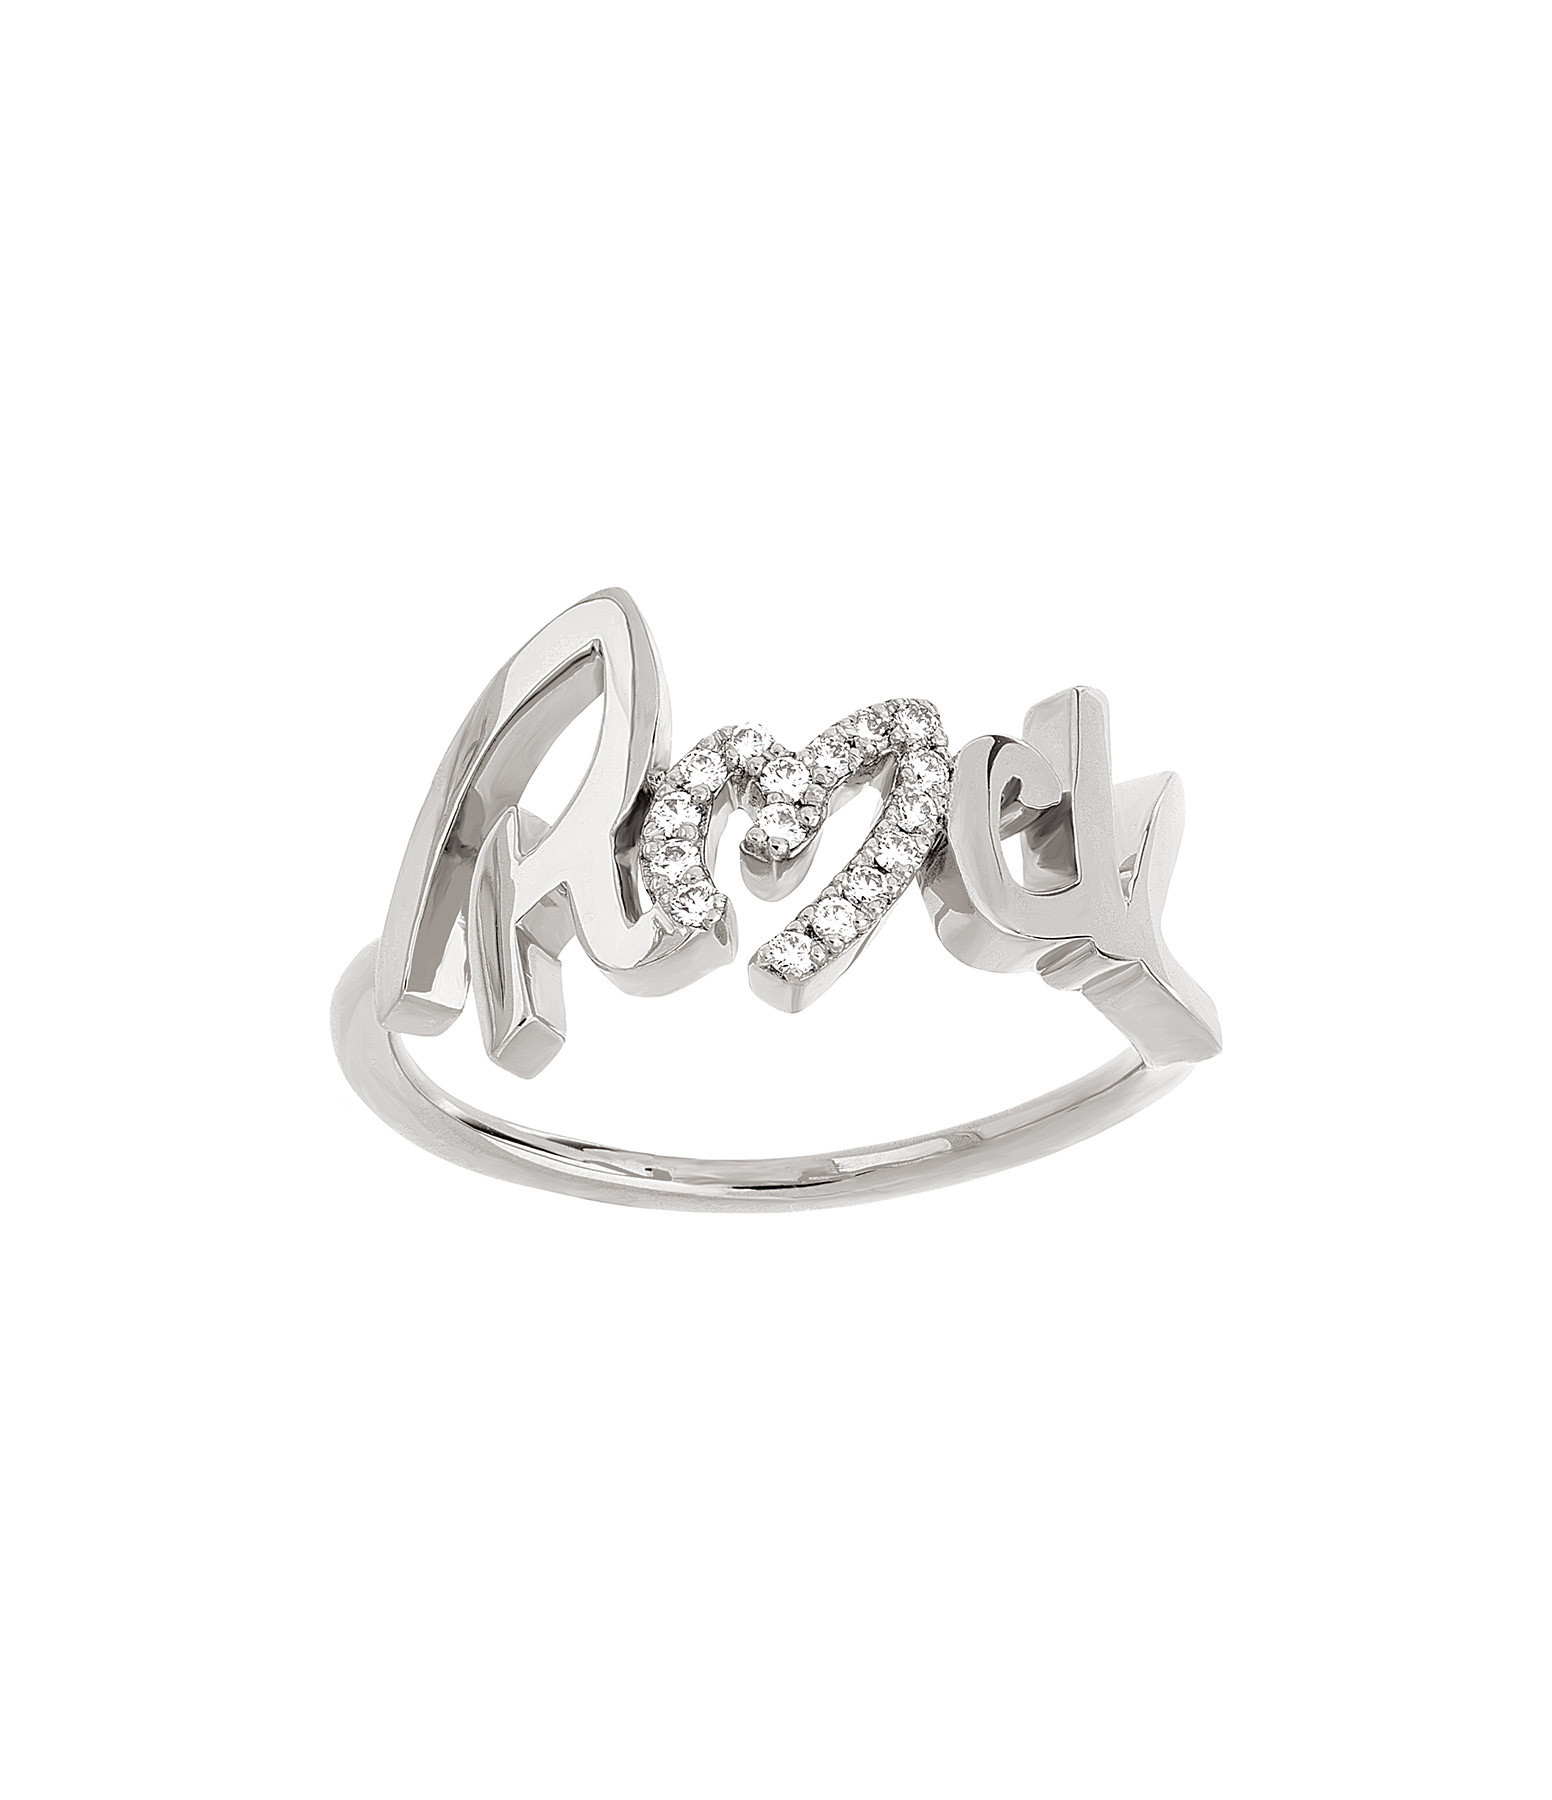 NAVA JOAILLERIE - Bague Rock Diamant Or Blanc